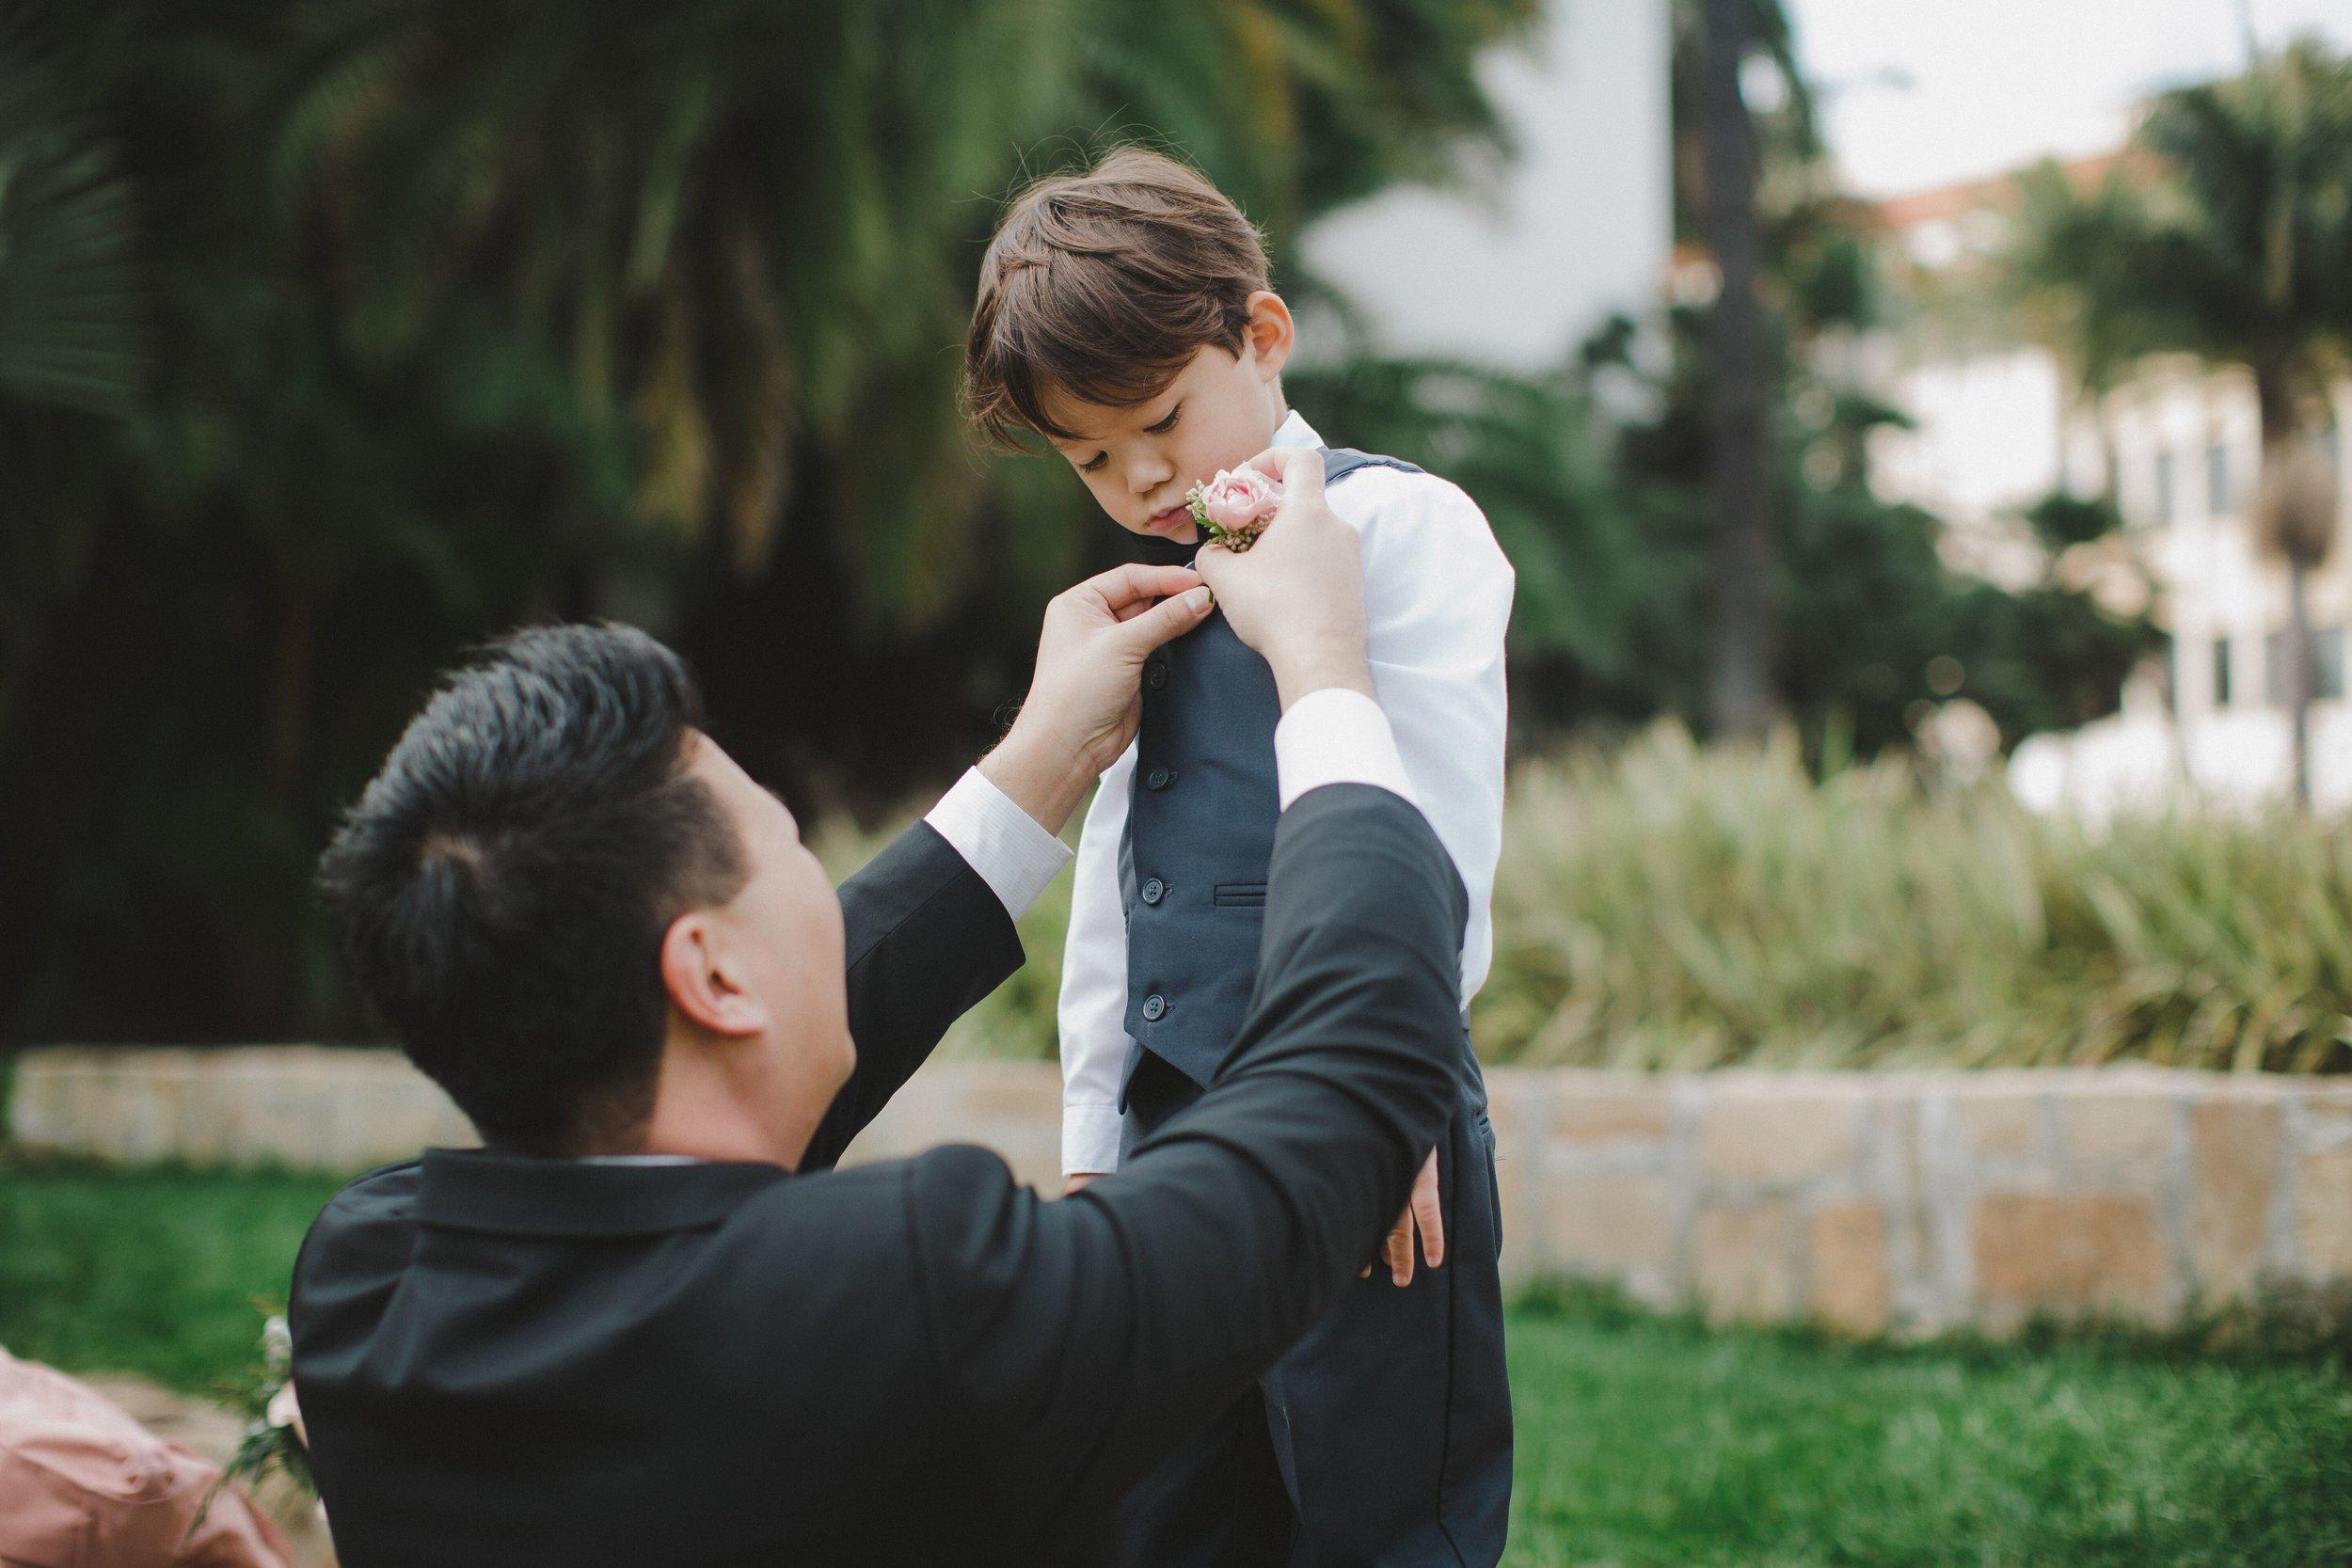 www.santabarbawedding.com | Venue: Santa Barbara Courthouse | Photography: Ryanne Bee Photography | Officiant: Santa Barbara Classic Weddings | Groom and Son as Best Man